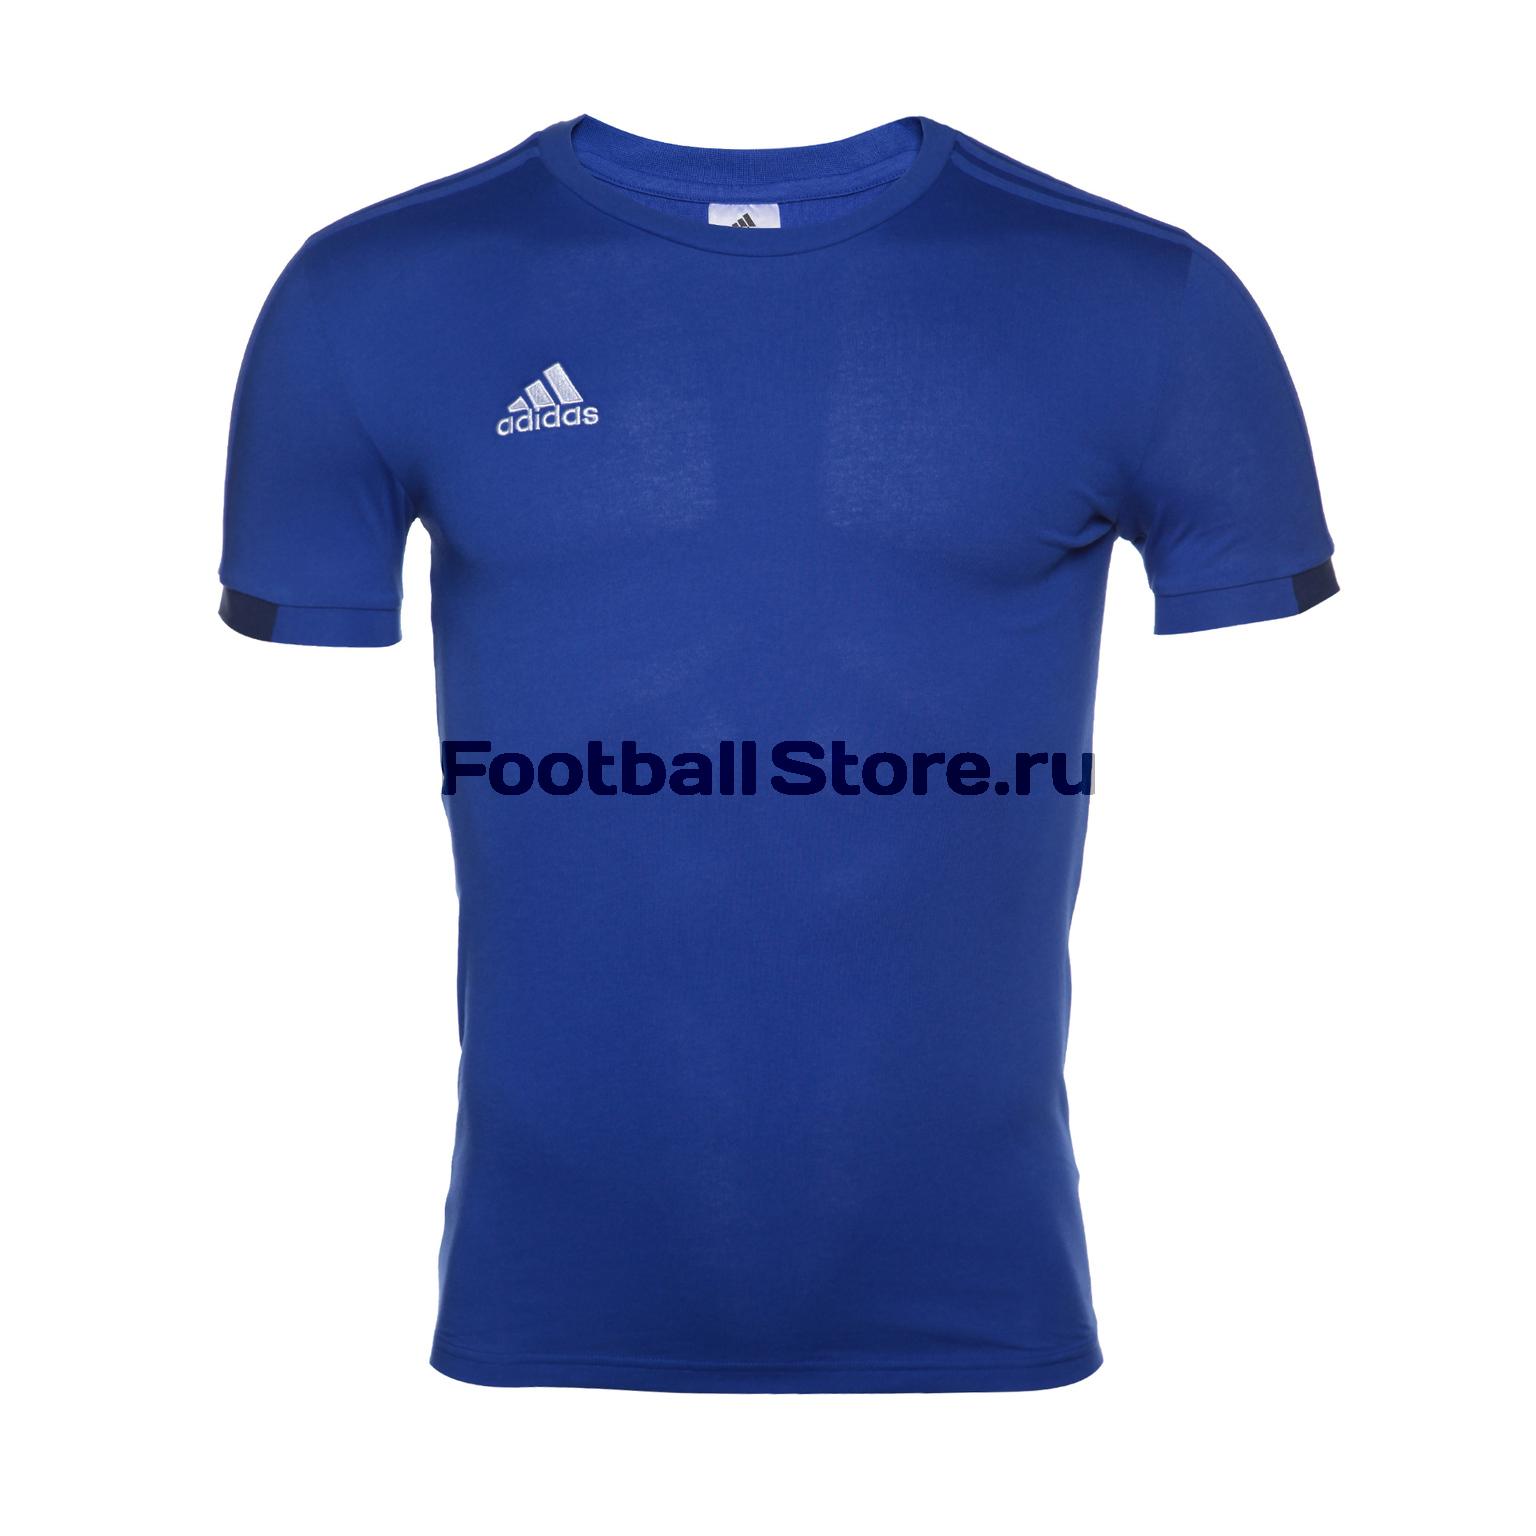 Футболка тренировочная Adidas Con18 Tee CF4365